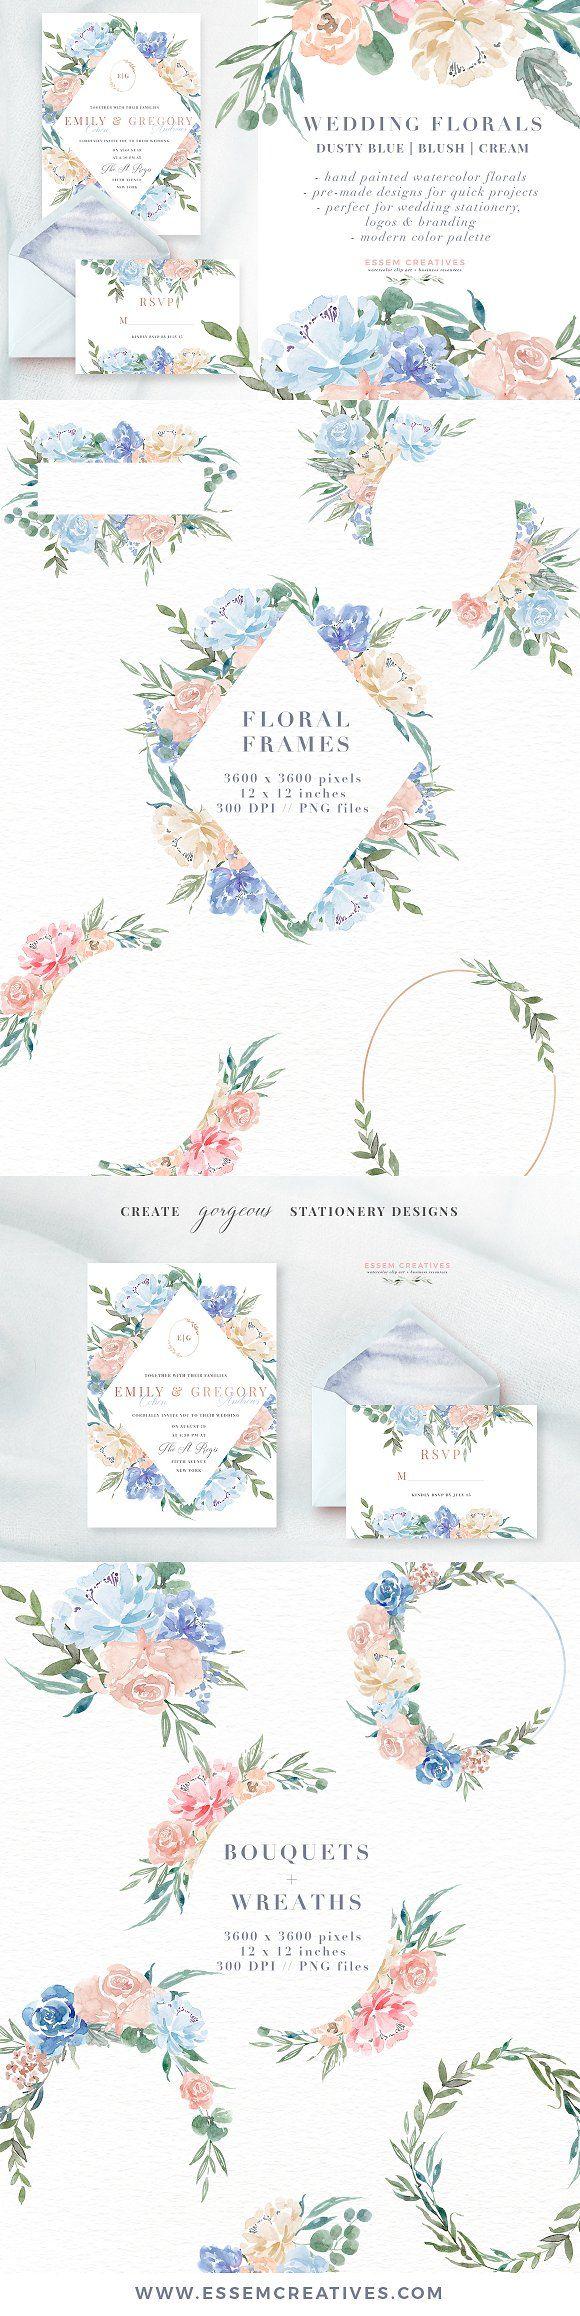 best wedding ideas images on pinterest engagements wedding